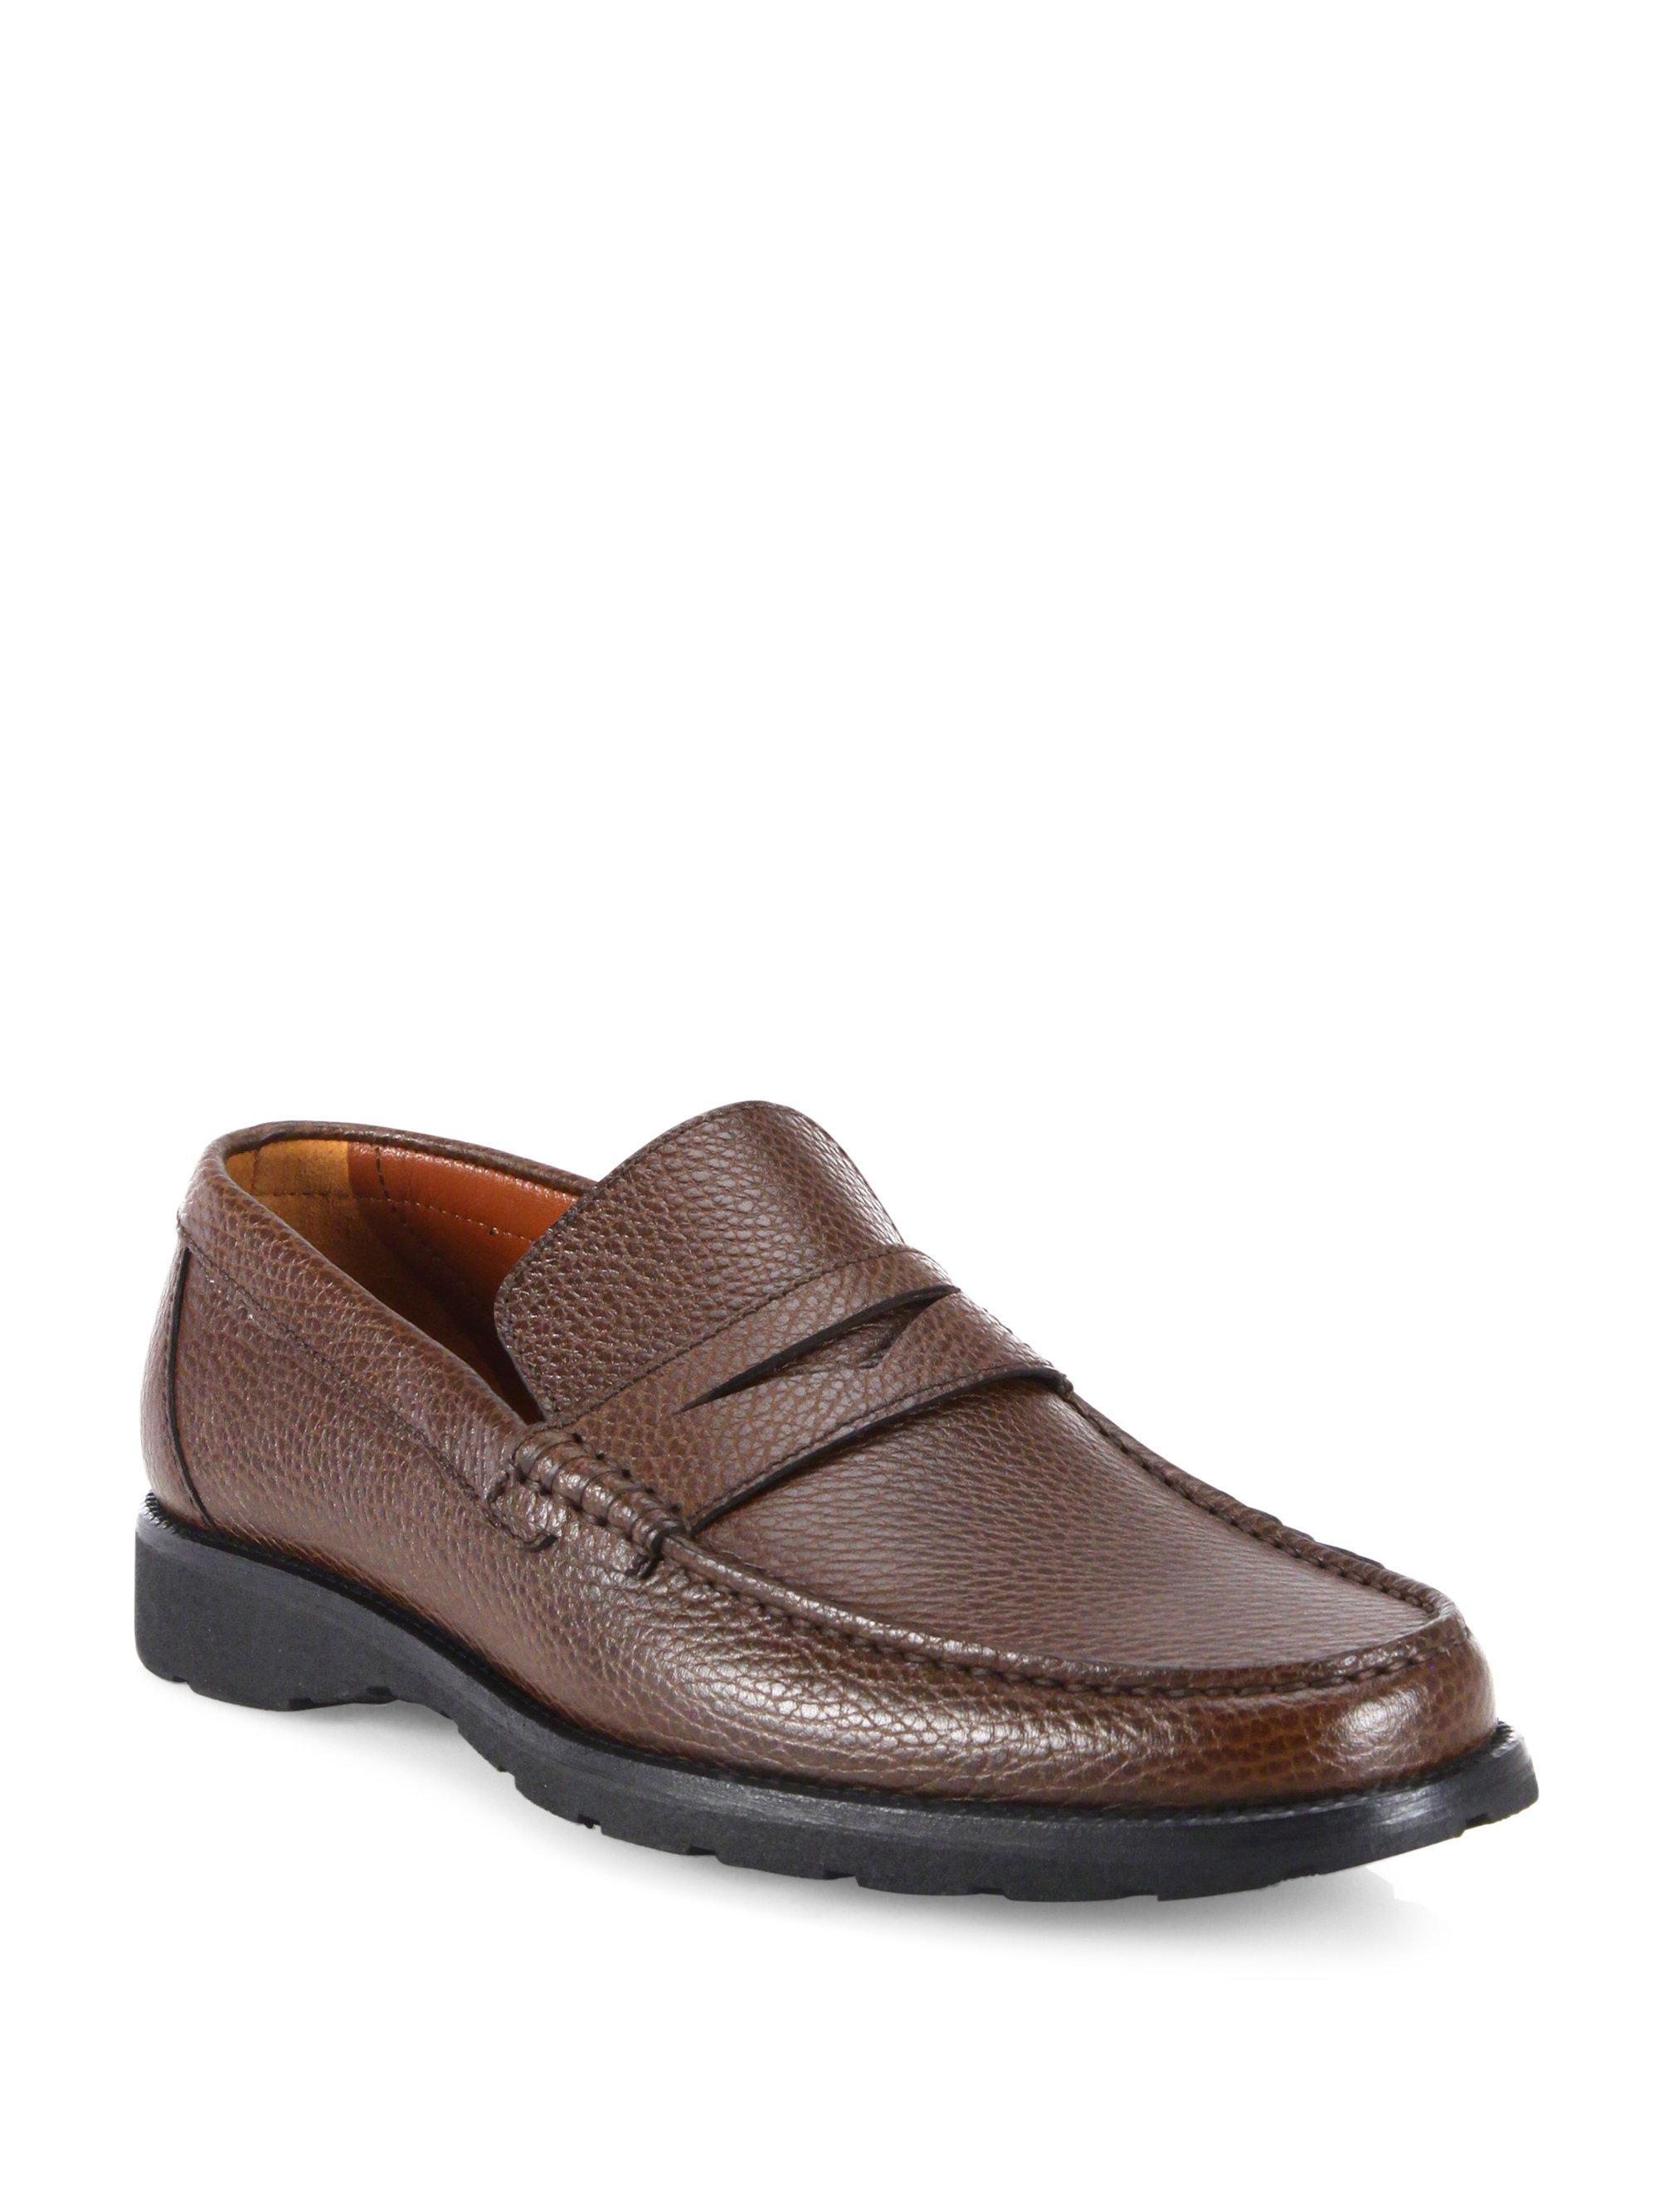 A.TESTONI Designer Shoes, Woven Leather Slip-on Shoe